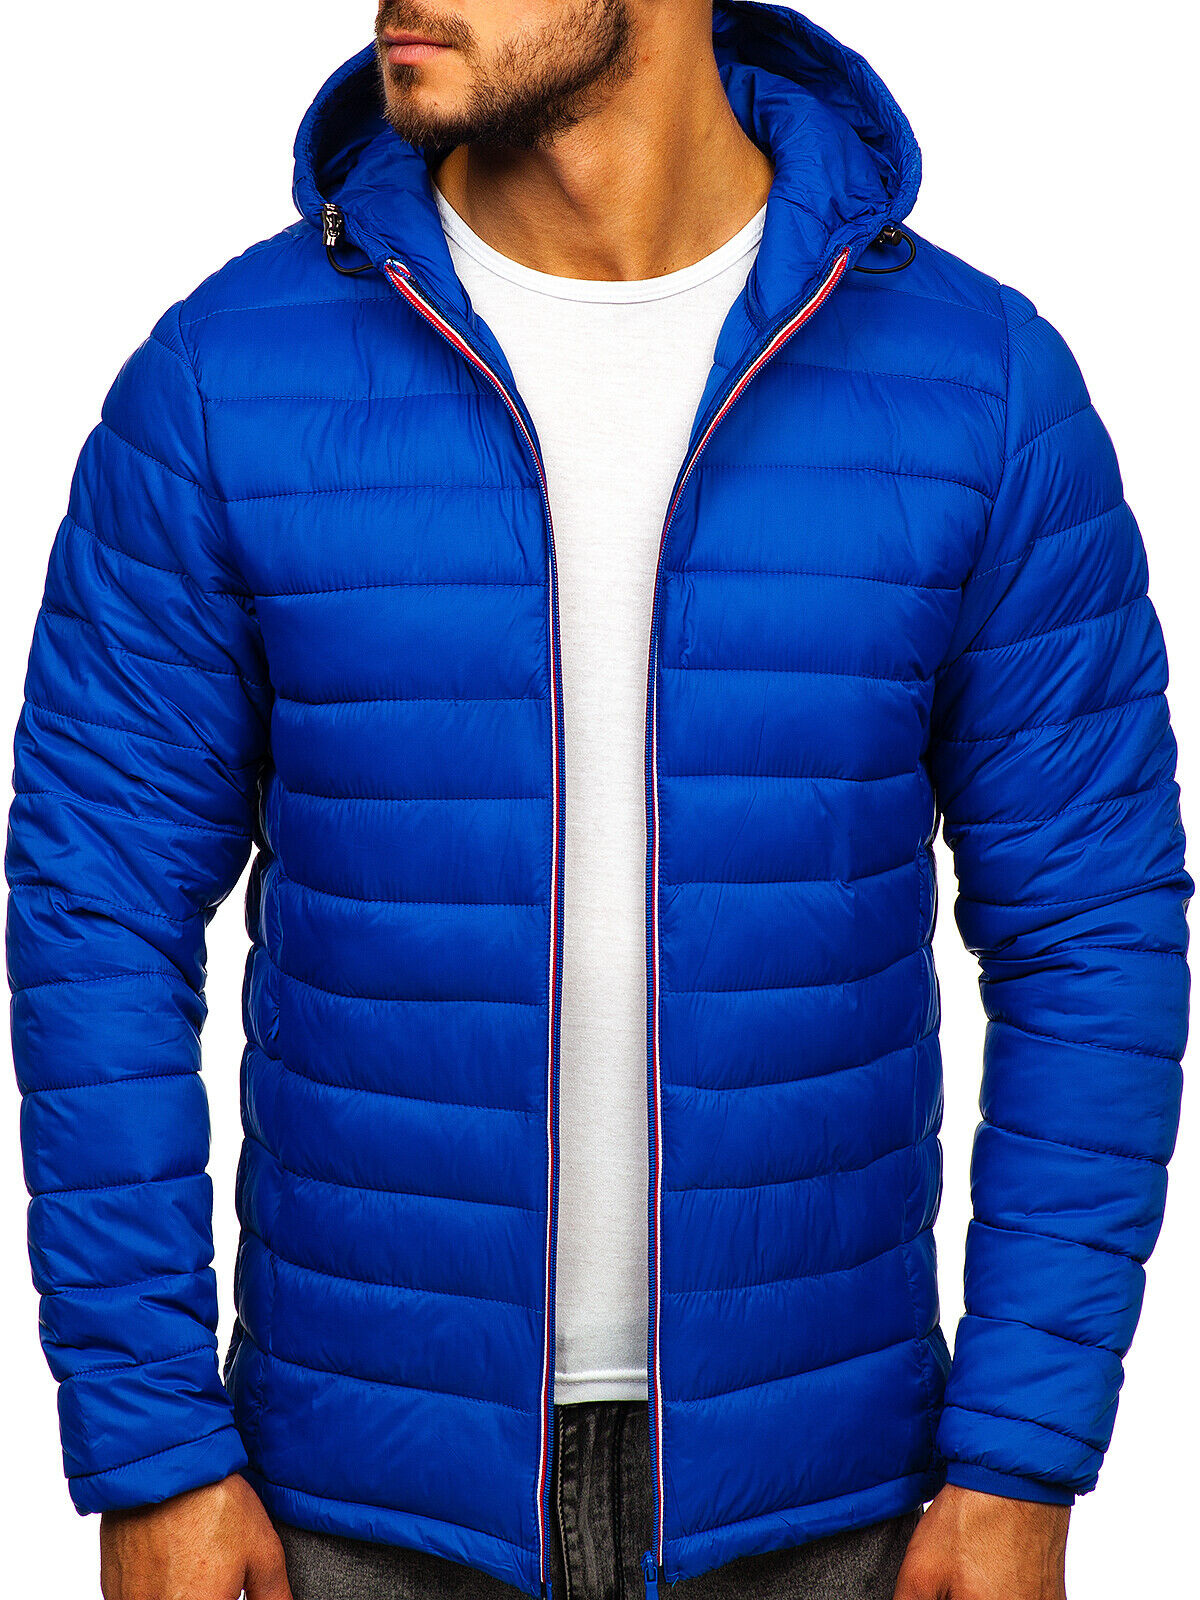 J.Style LY1018 Blau